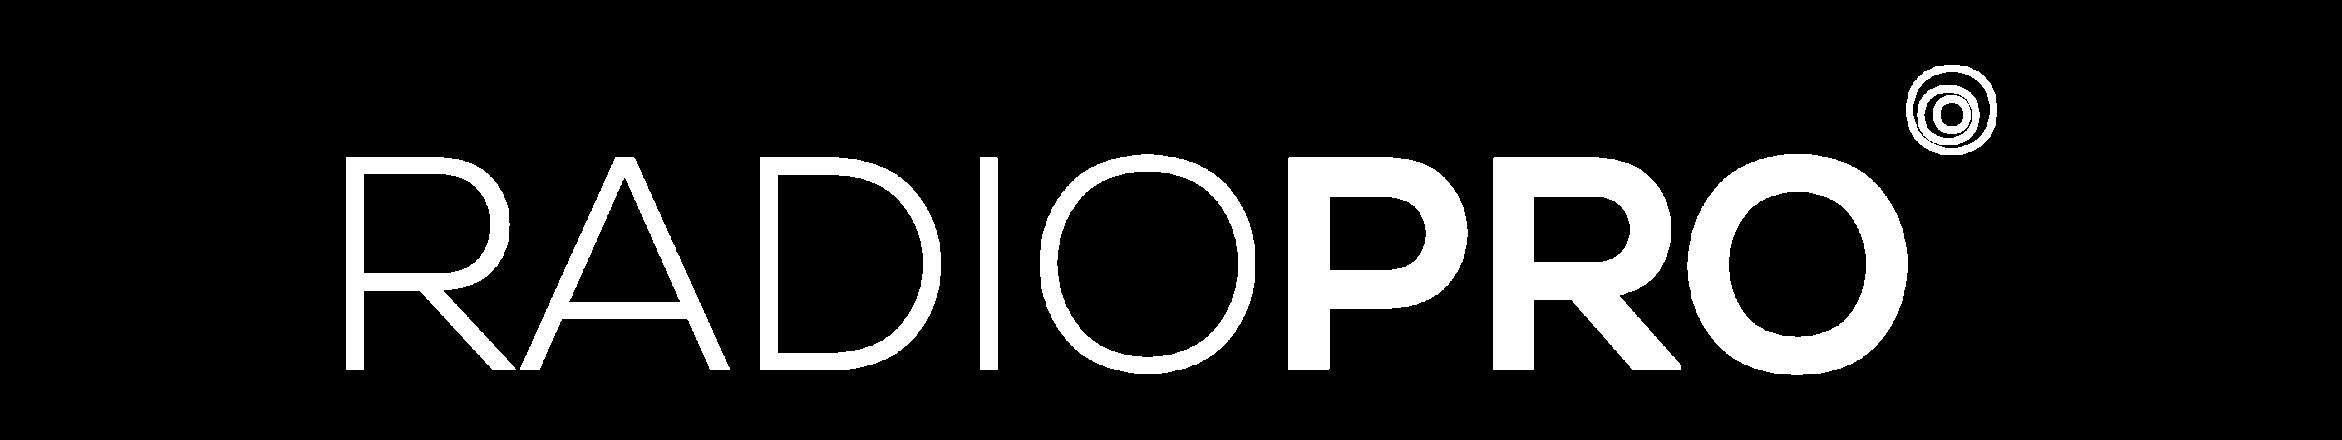 RadioPro